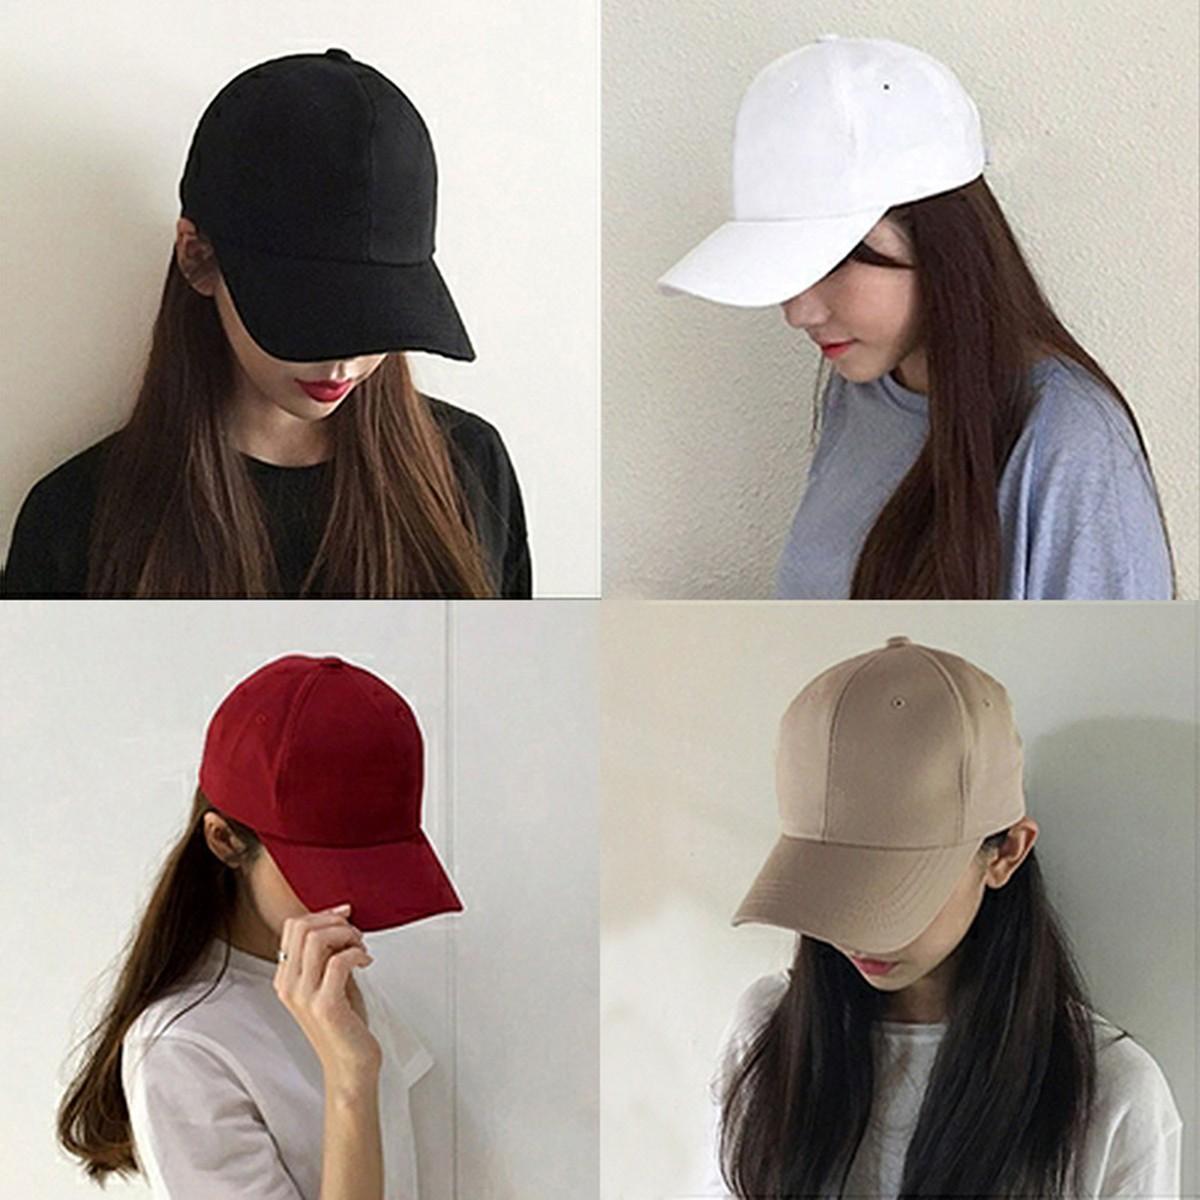 2020 The New Mens Womens Hats Kpop Fashion Casual Baseball Cap Solid Color Black Peaked Cap Versatile Student Hat Sunshade Cap